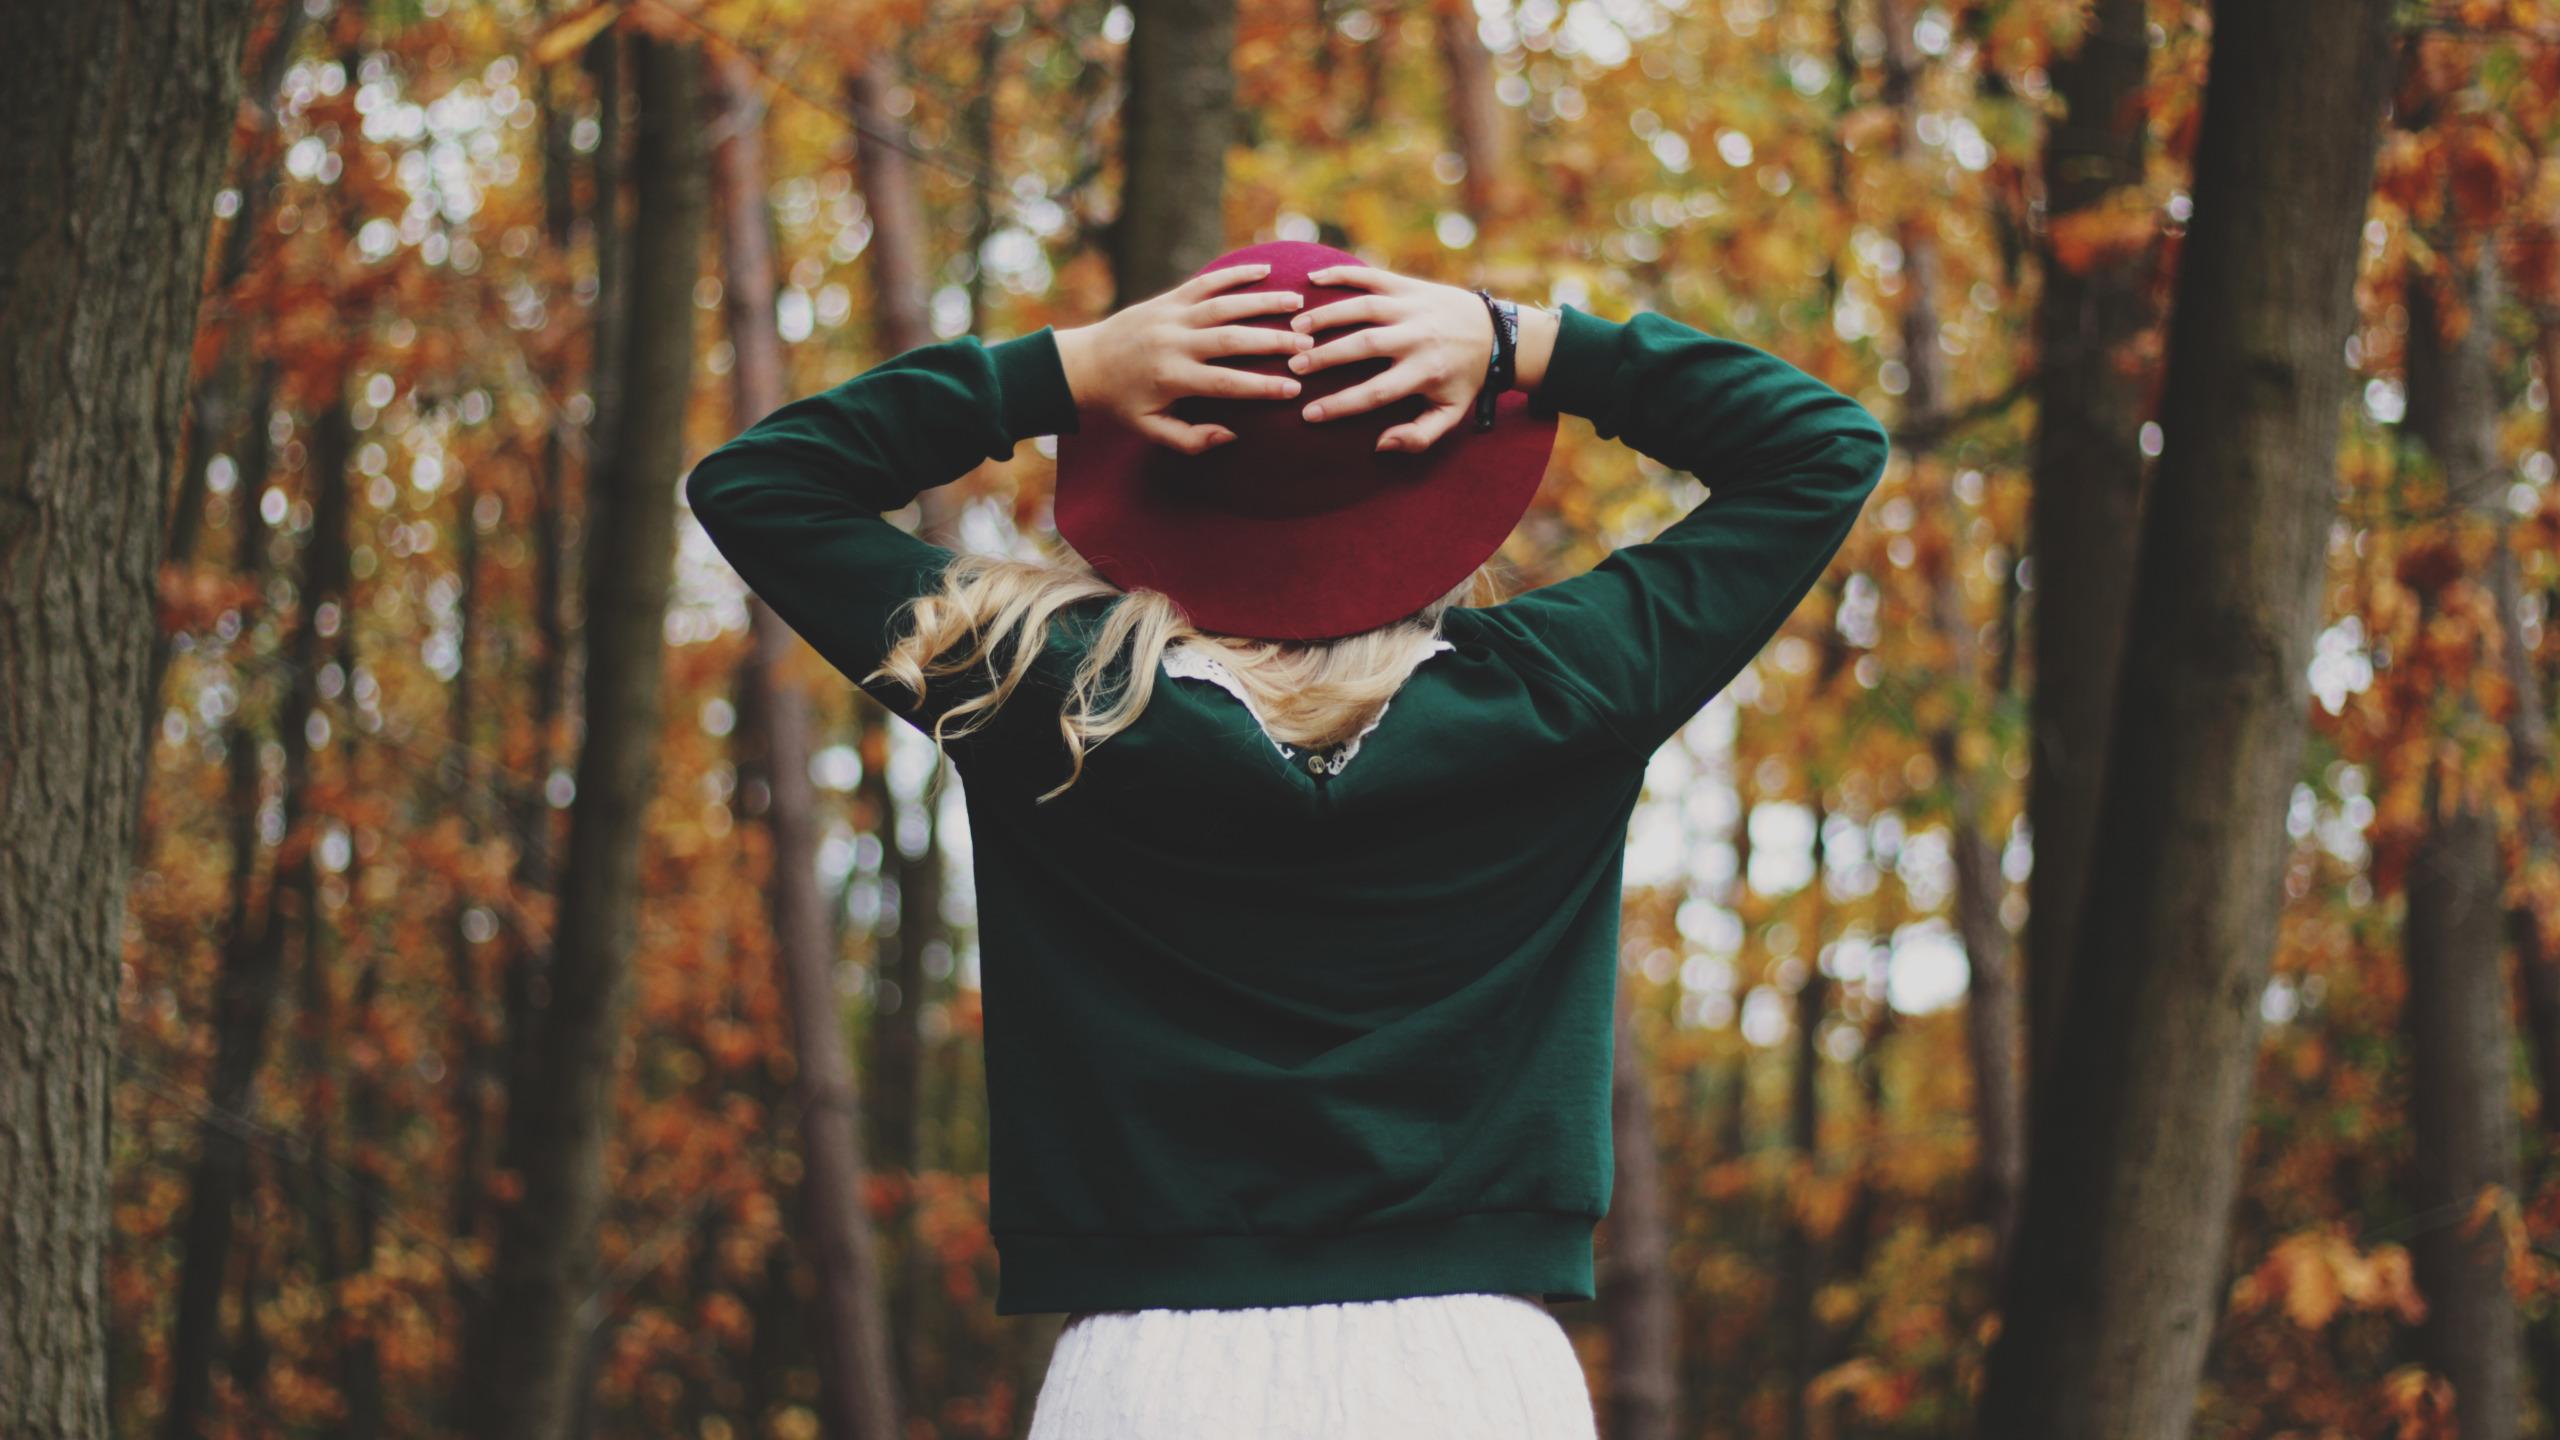 Фото на аву девушкам осенью